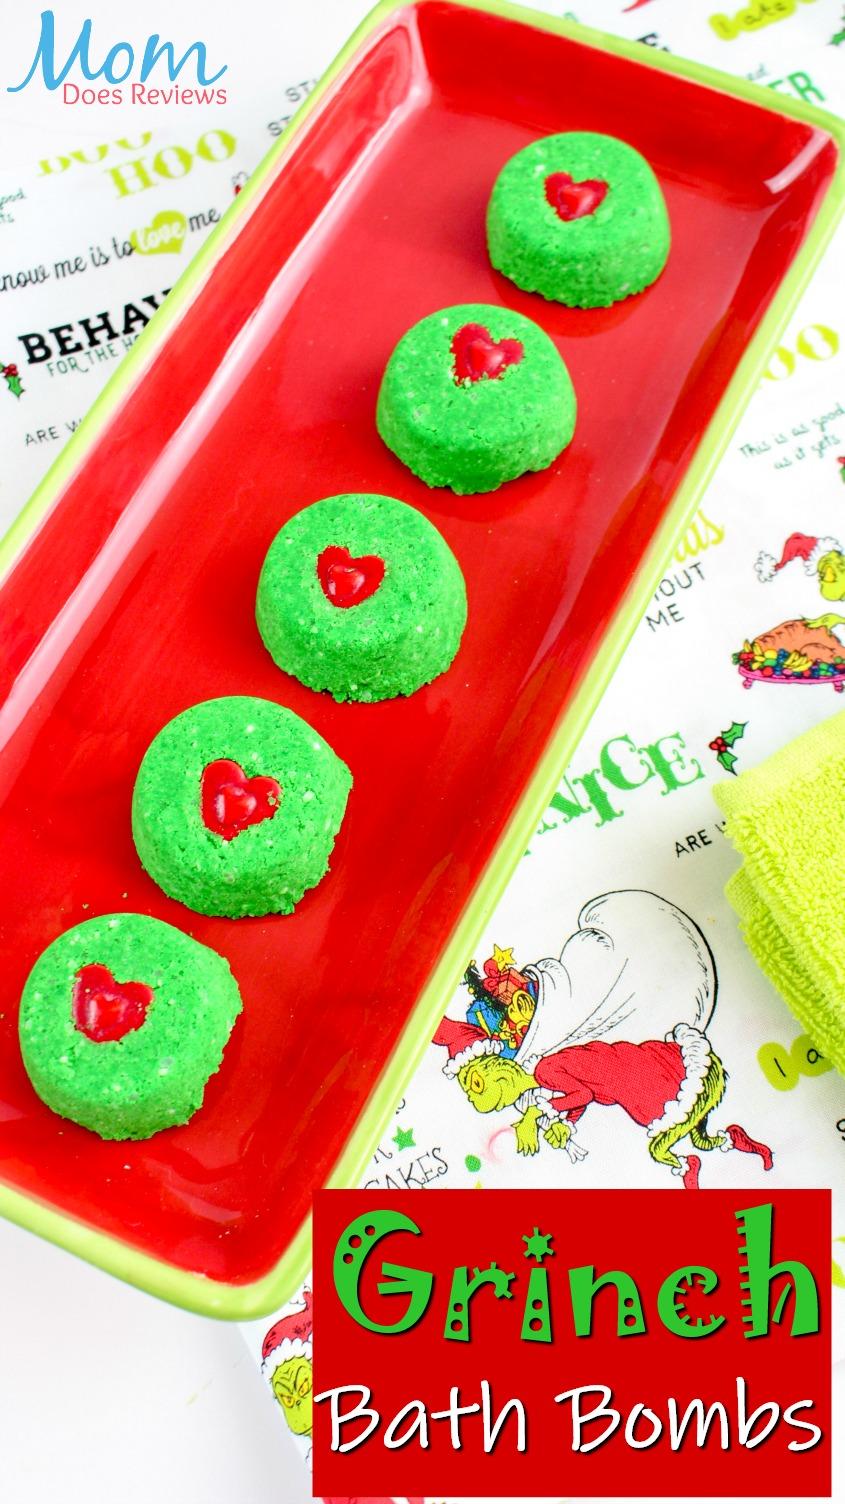 Grinch Bath Bombs #DIY #Crafts #bathbombs #essentialoils #thegrinch